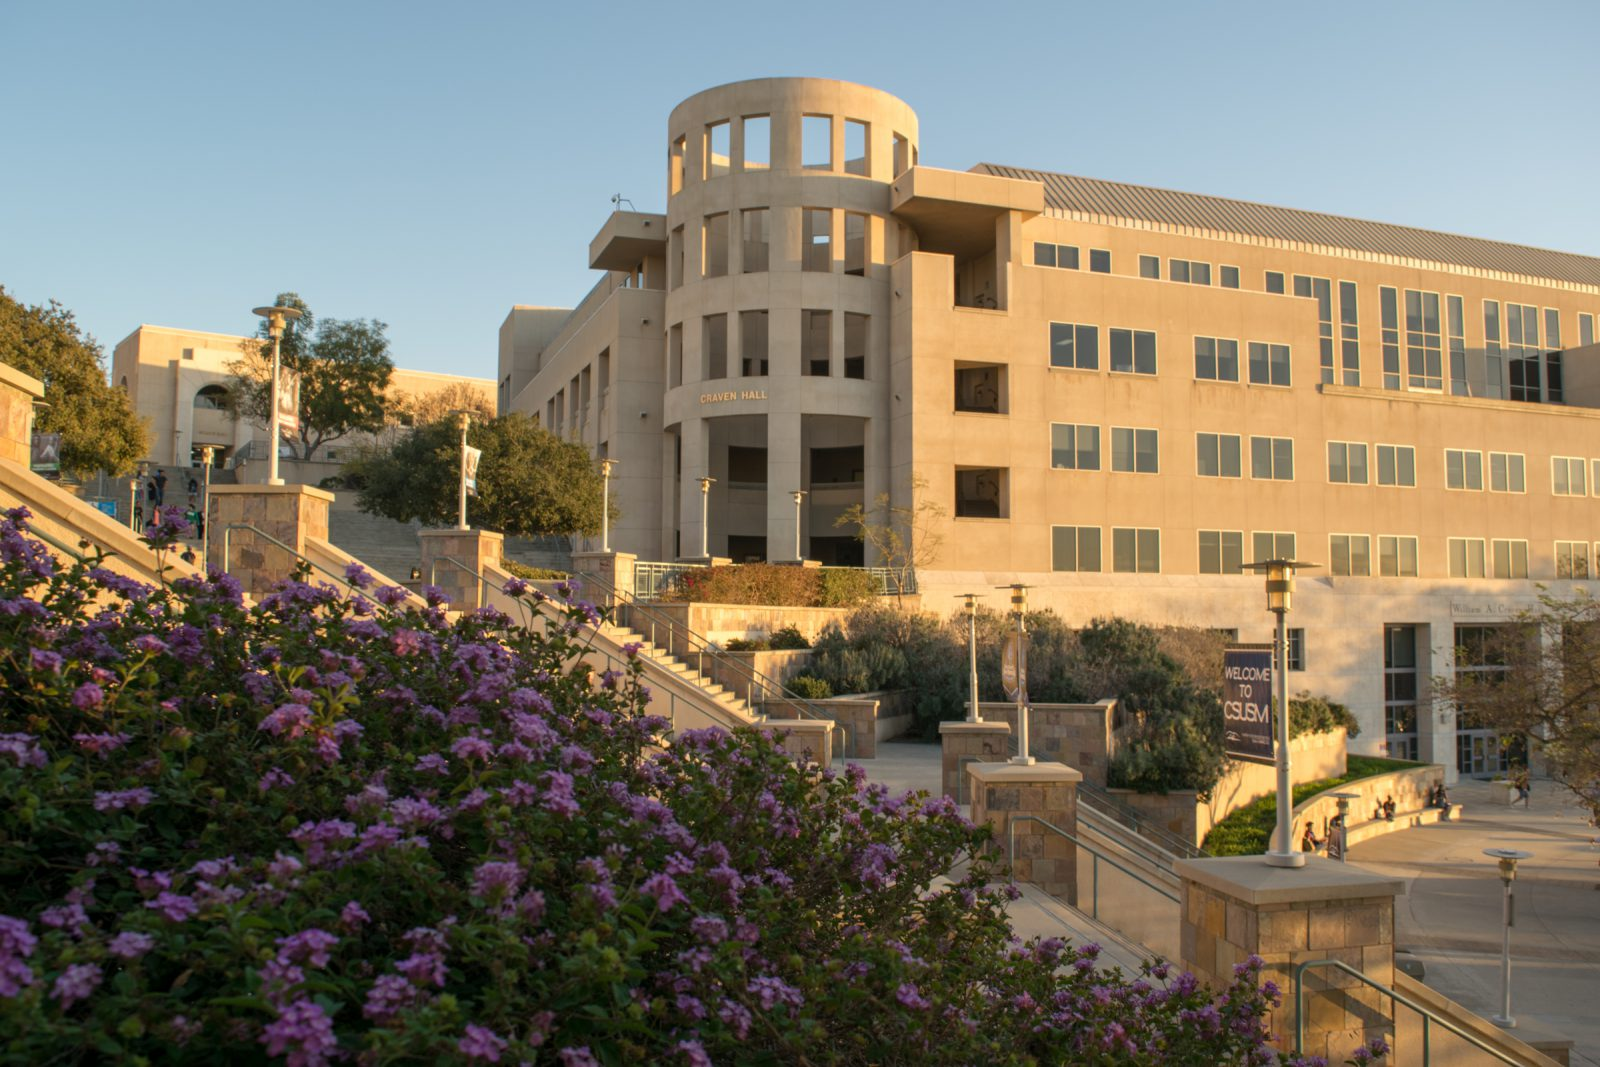 Csu San Marcos >> California State University San Marcos - Blueberry College